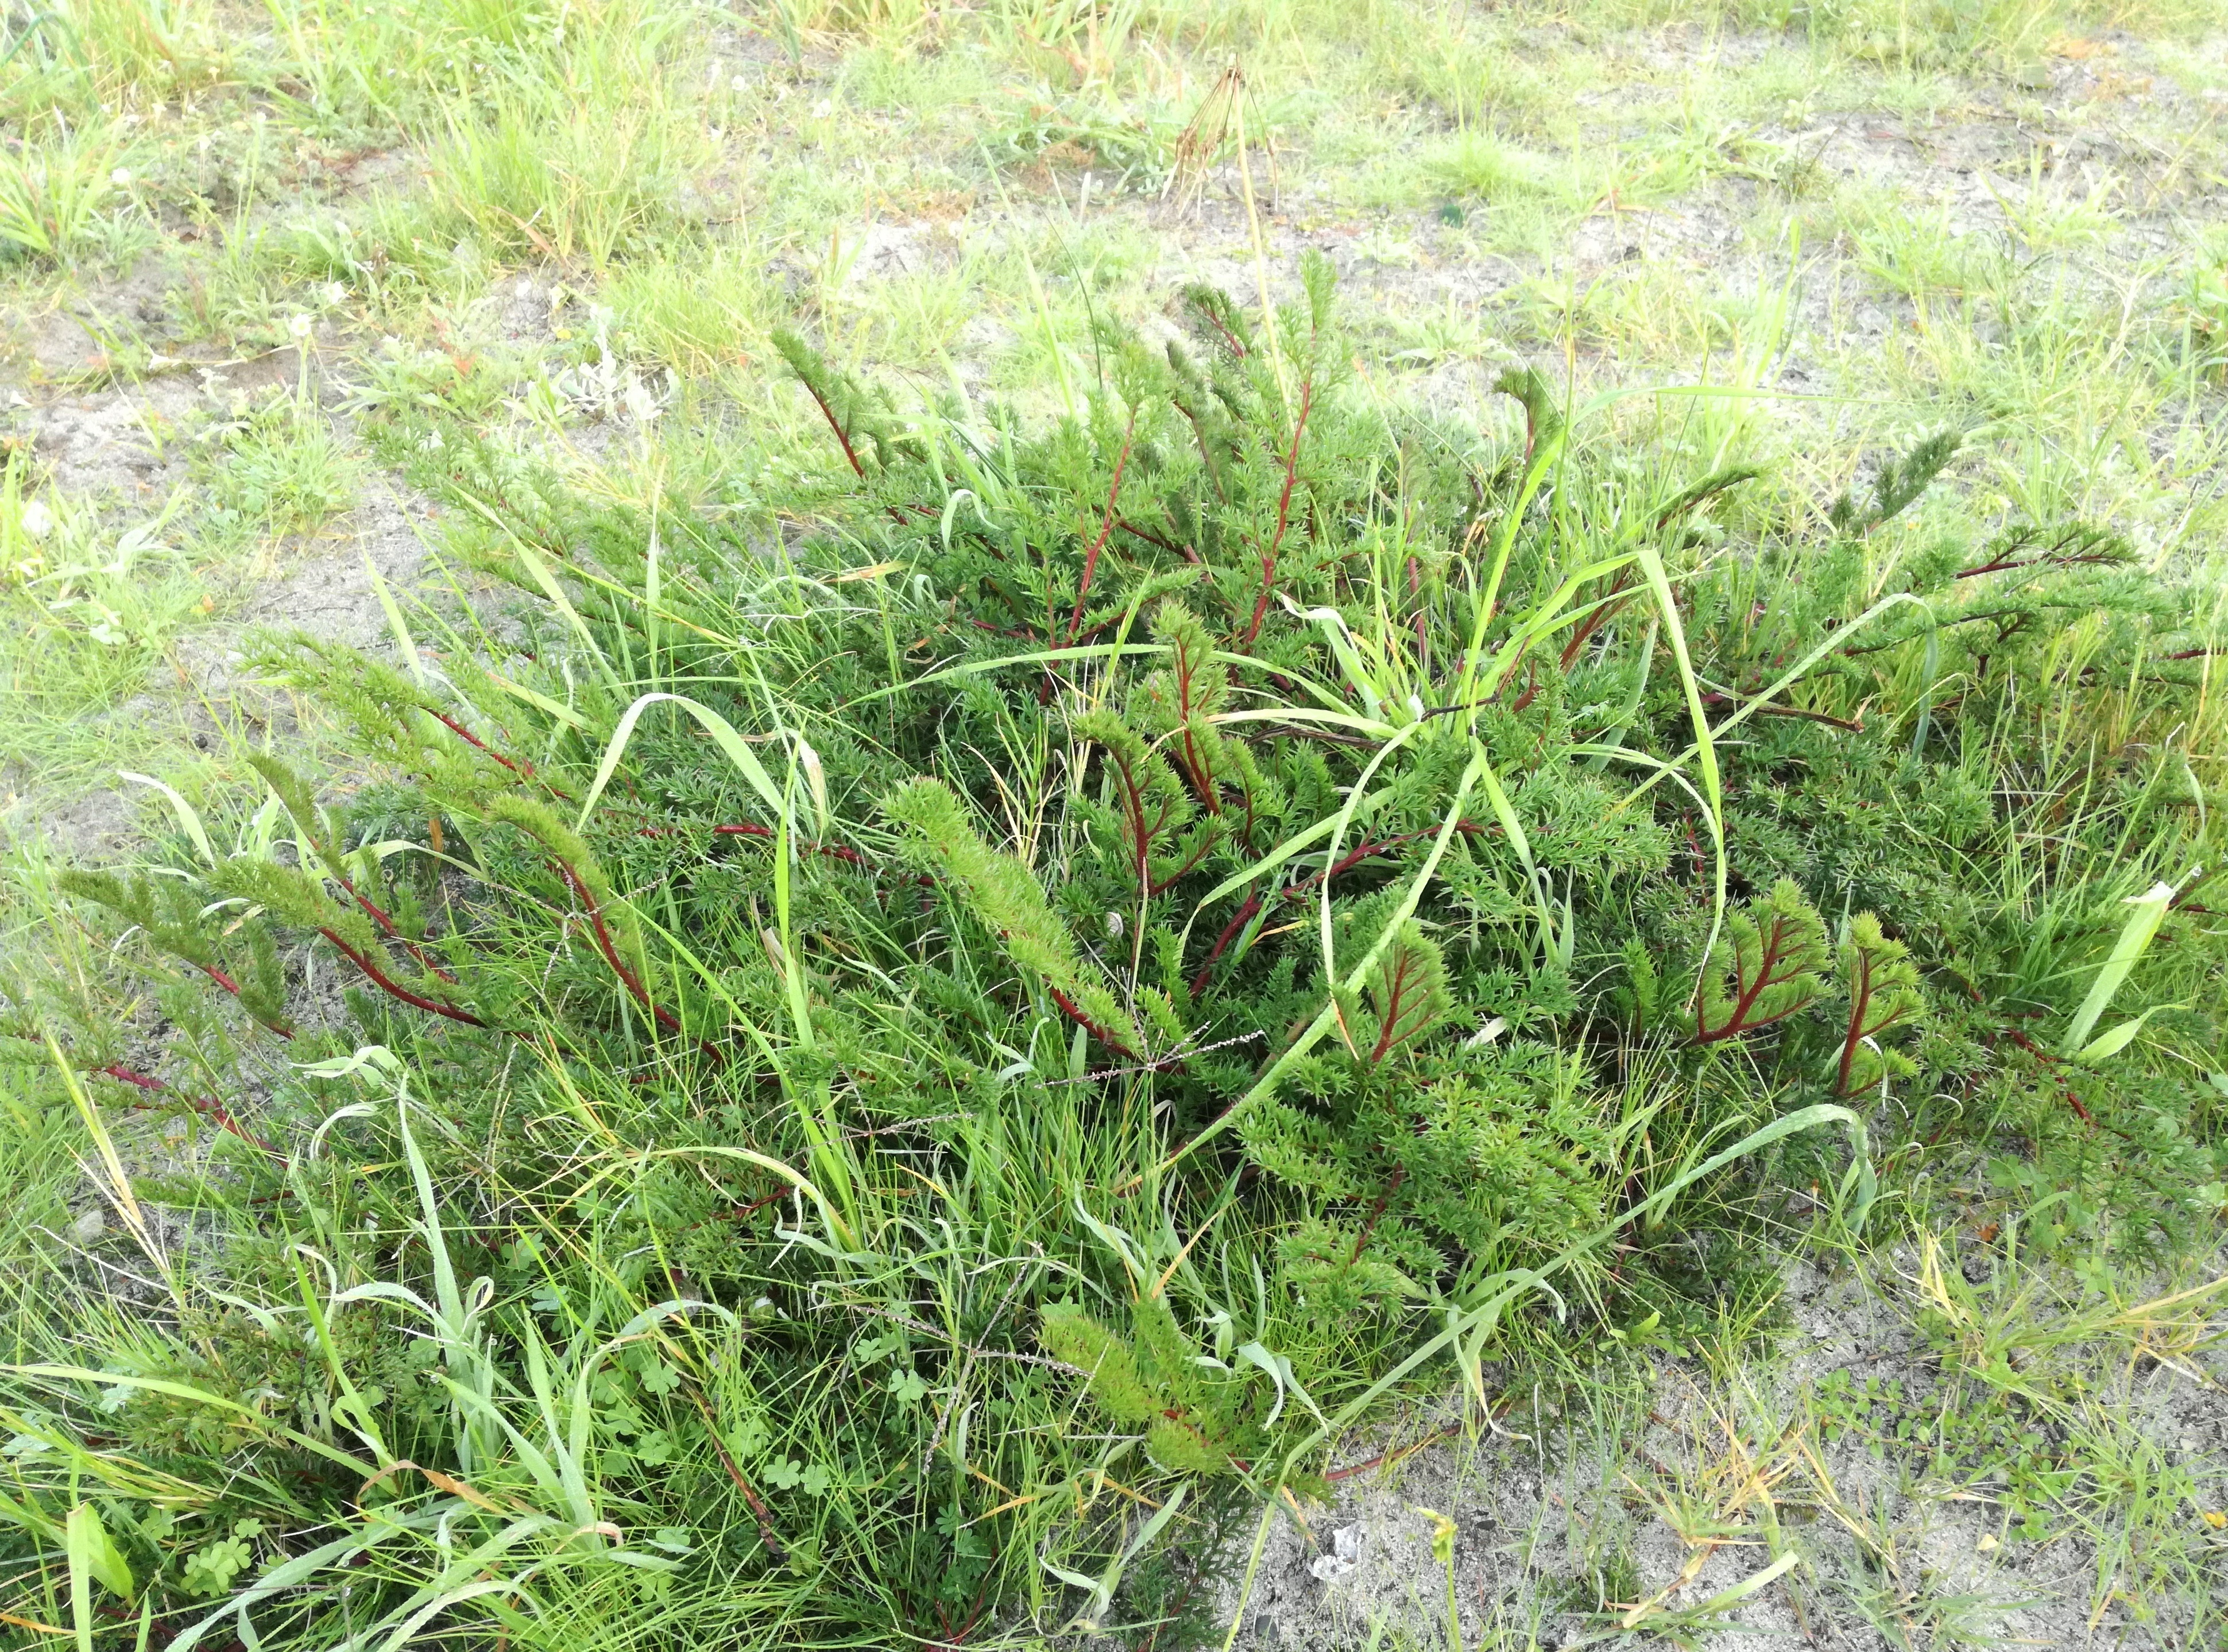 1 pelargonium triste - kenwyn nature park - cape town a.jpg